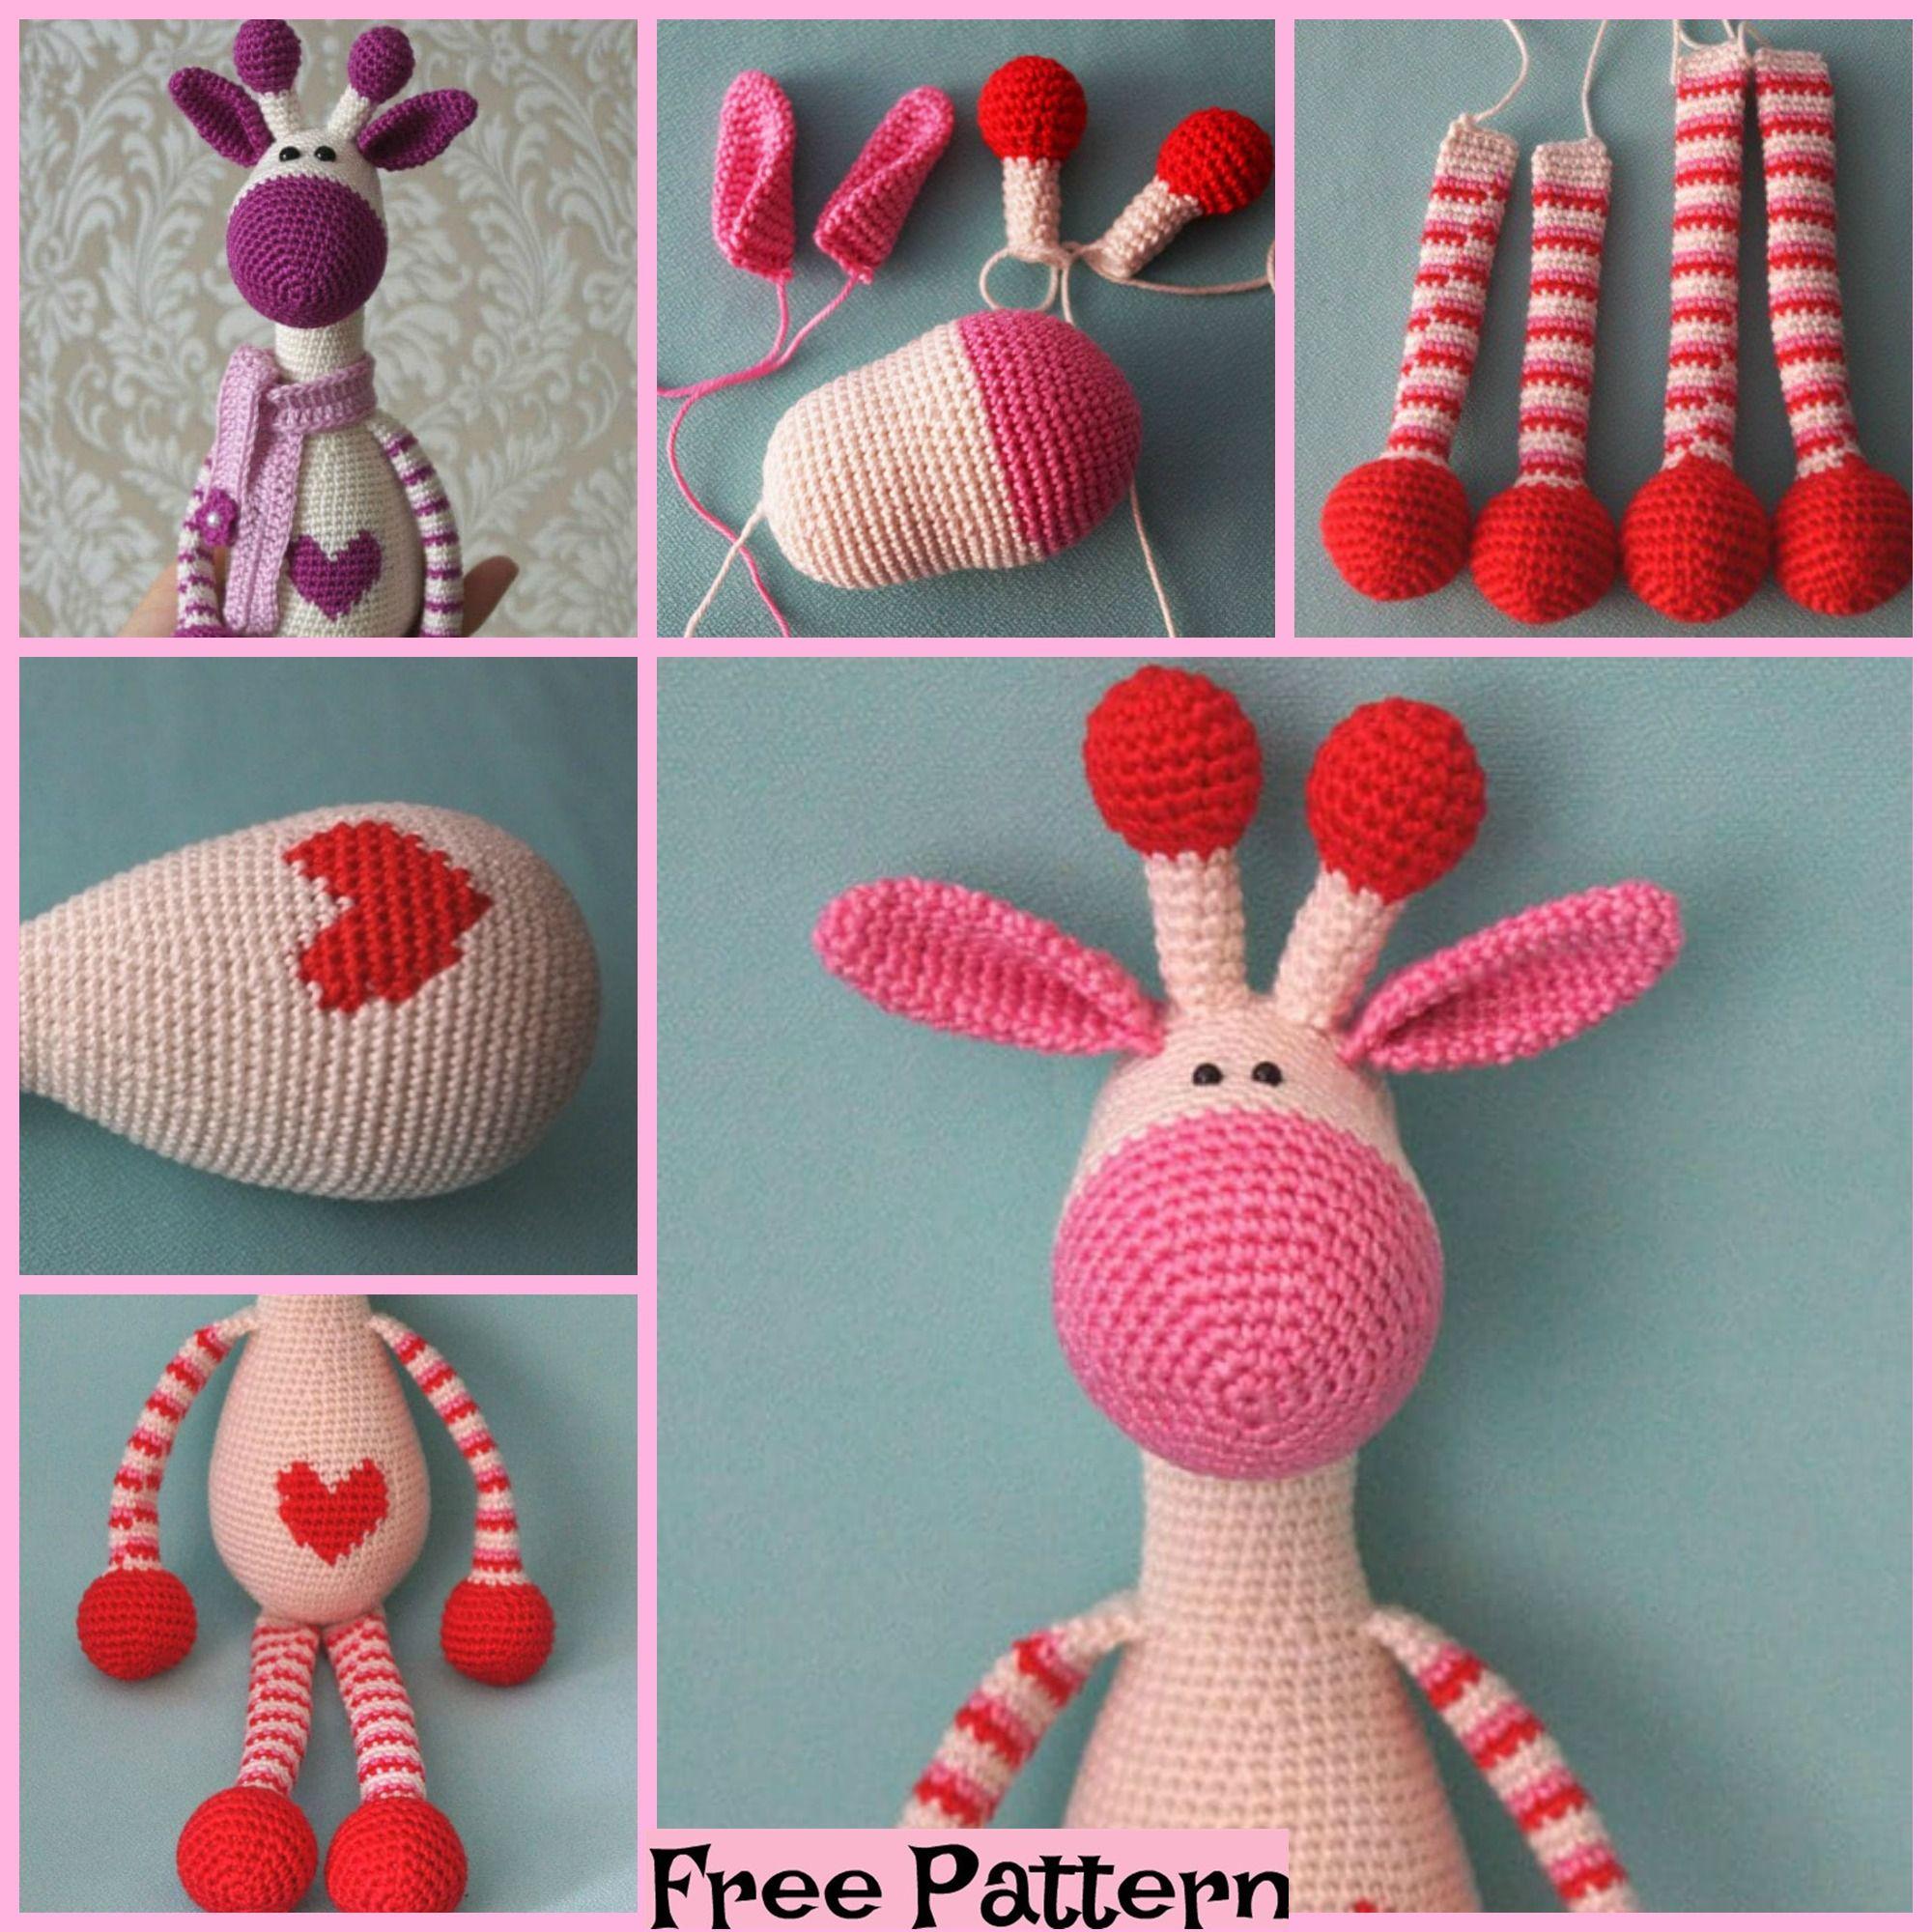 Crochet Hearty Giraffe Amigurumi Free Pattern - DIY Magazine | 2000x2000